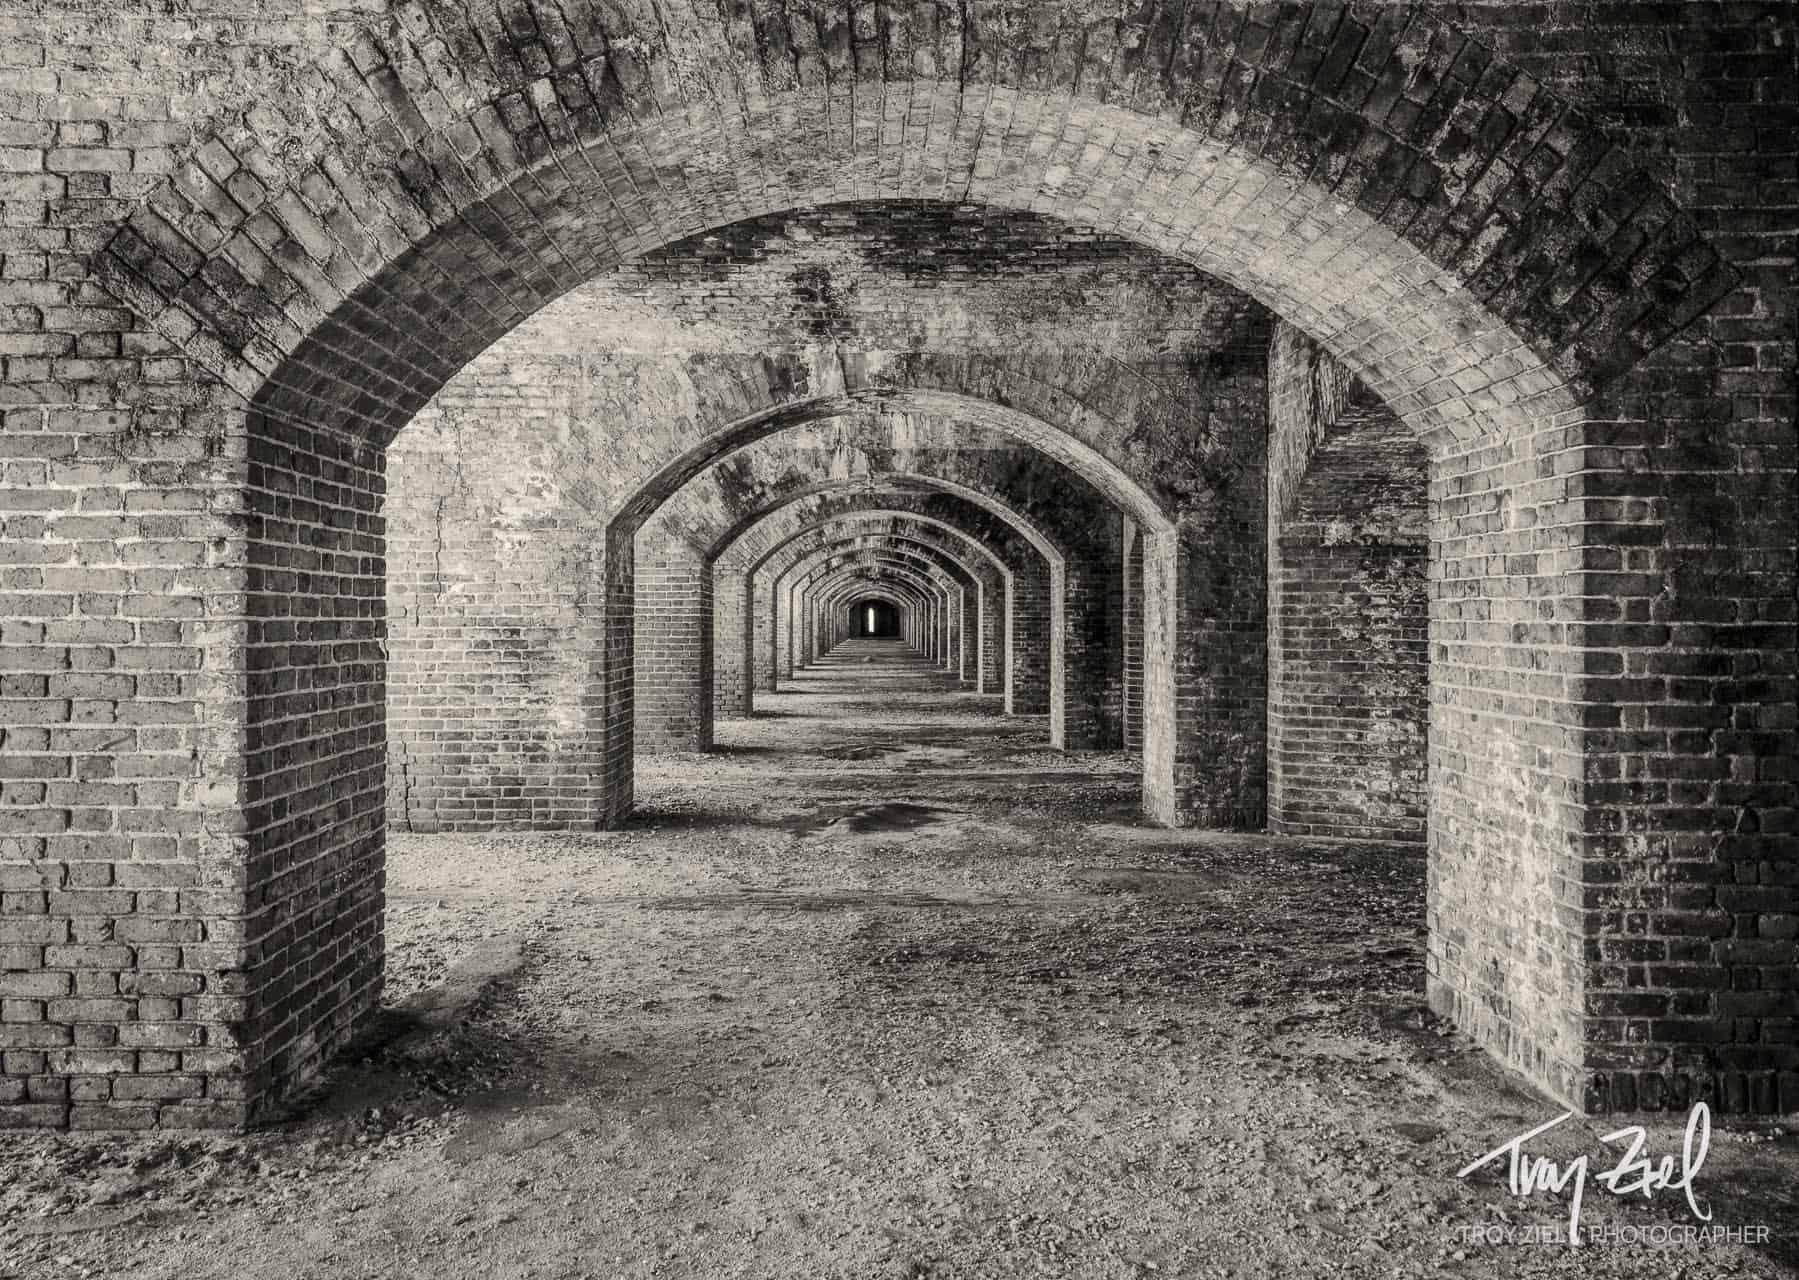 tunnelfort (1 of 1)